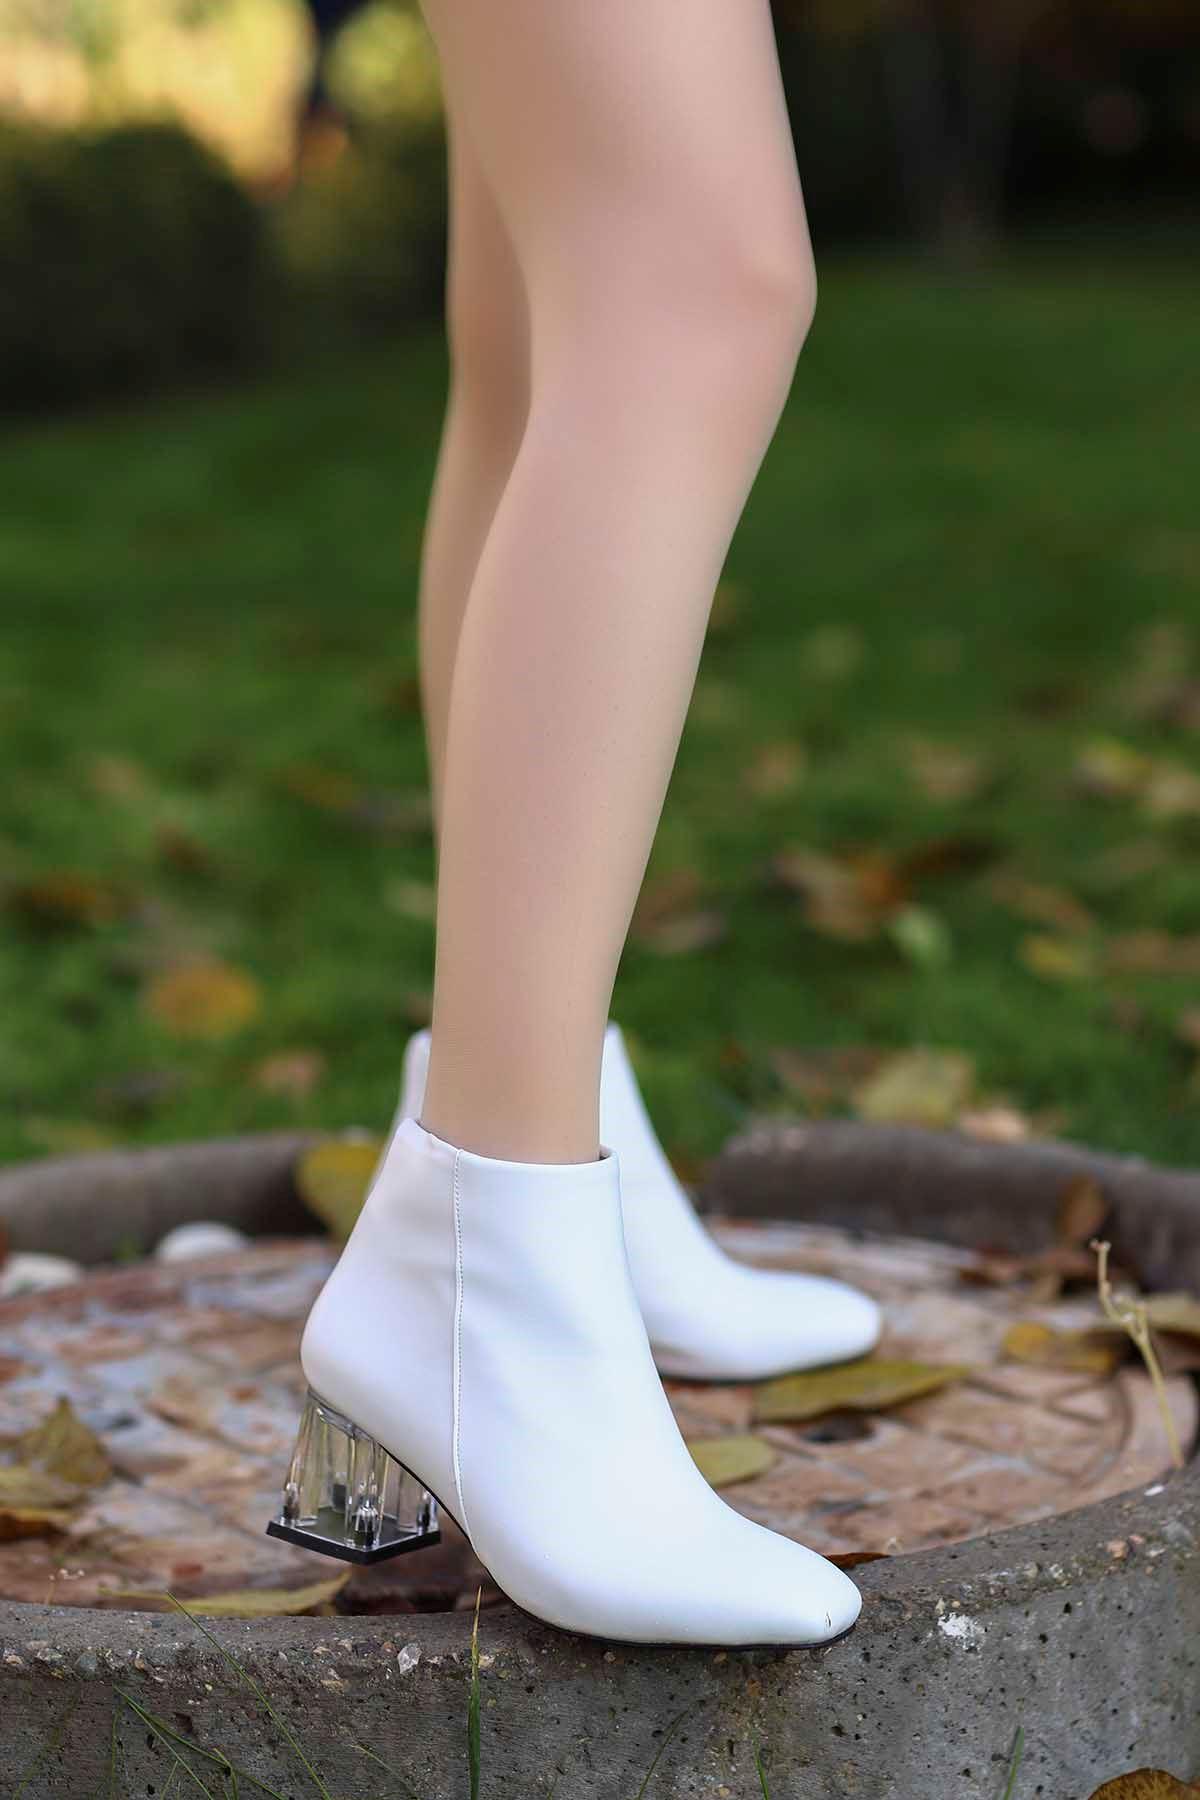 My-710 Küt Burun Şeffaf Topuklu Bot Beyaz Deri